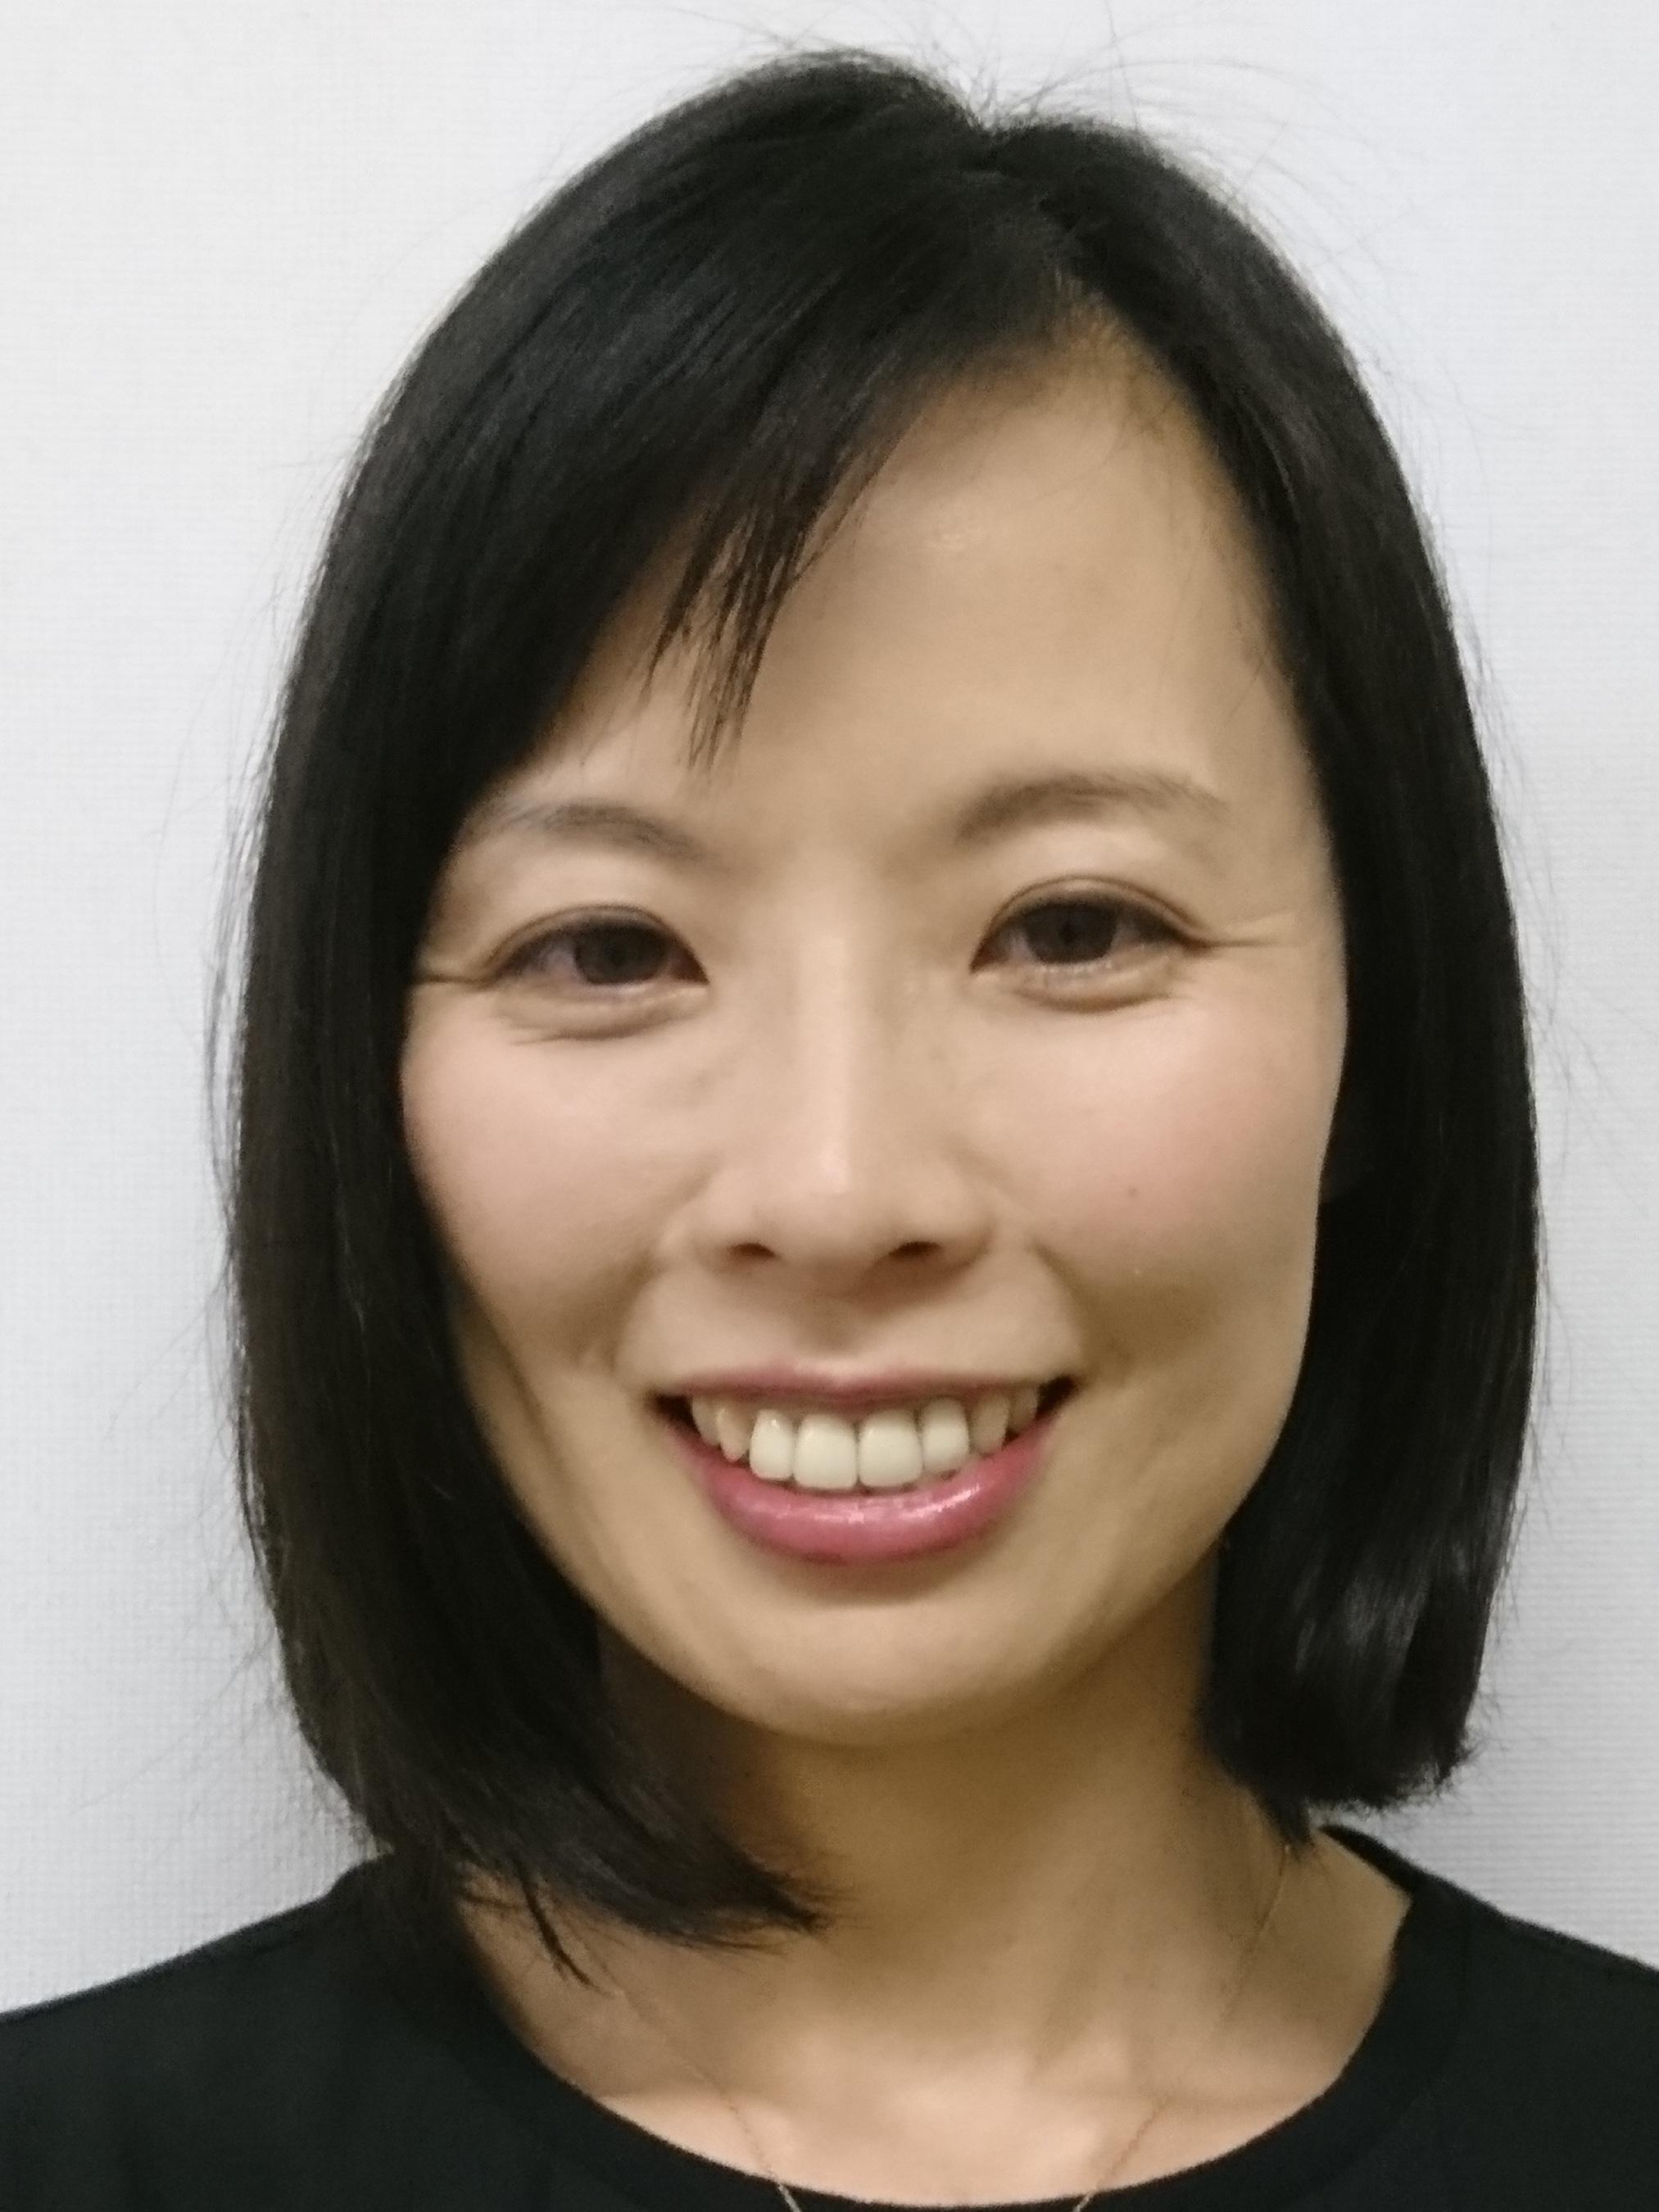 Ayumi Takano - 東京医科歯科大学 大学院保健衛生学研究科准教授Associate professor (Tokyo Medical and Dental University)